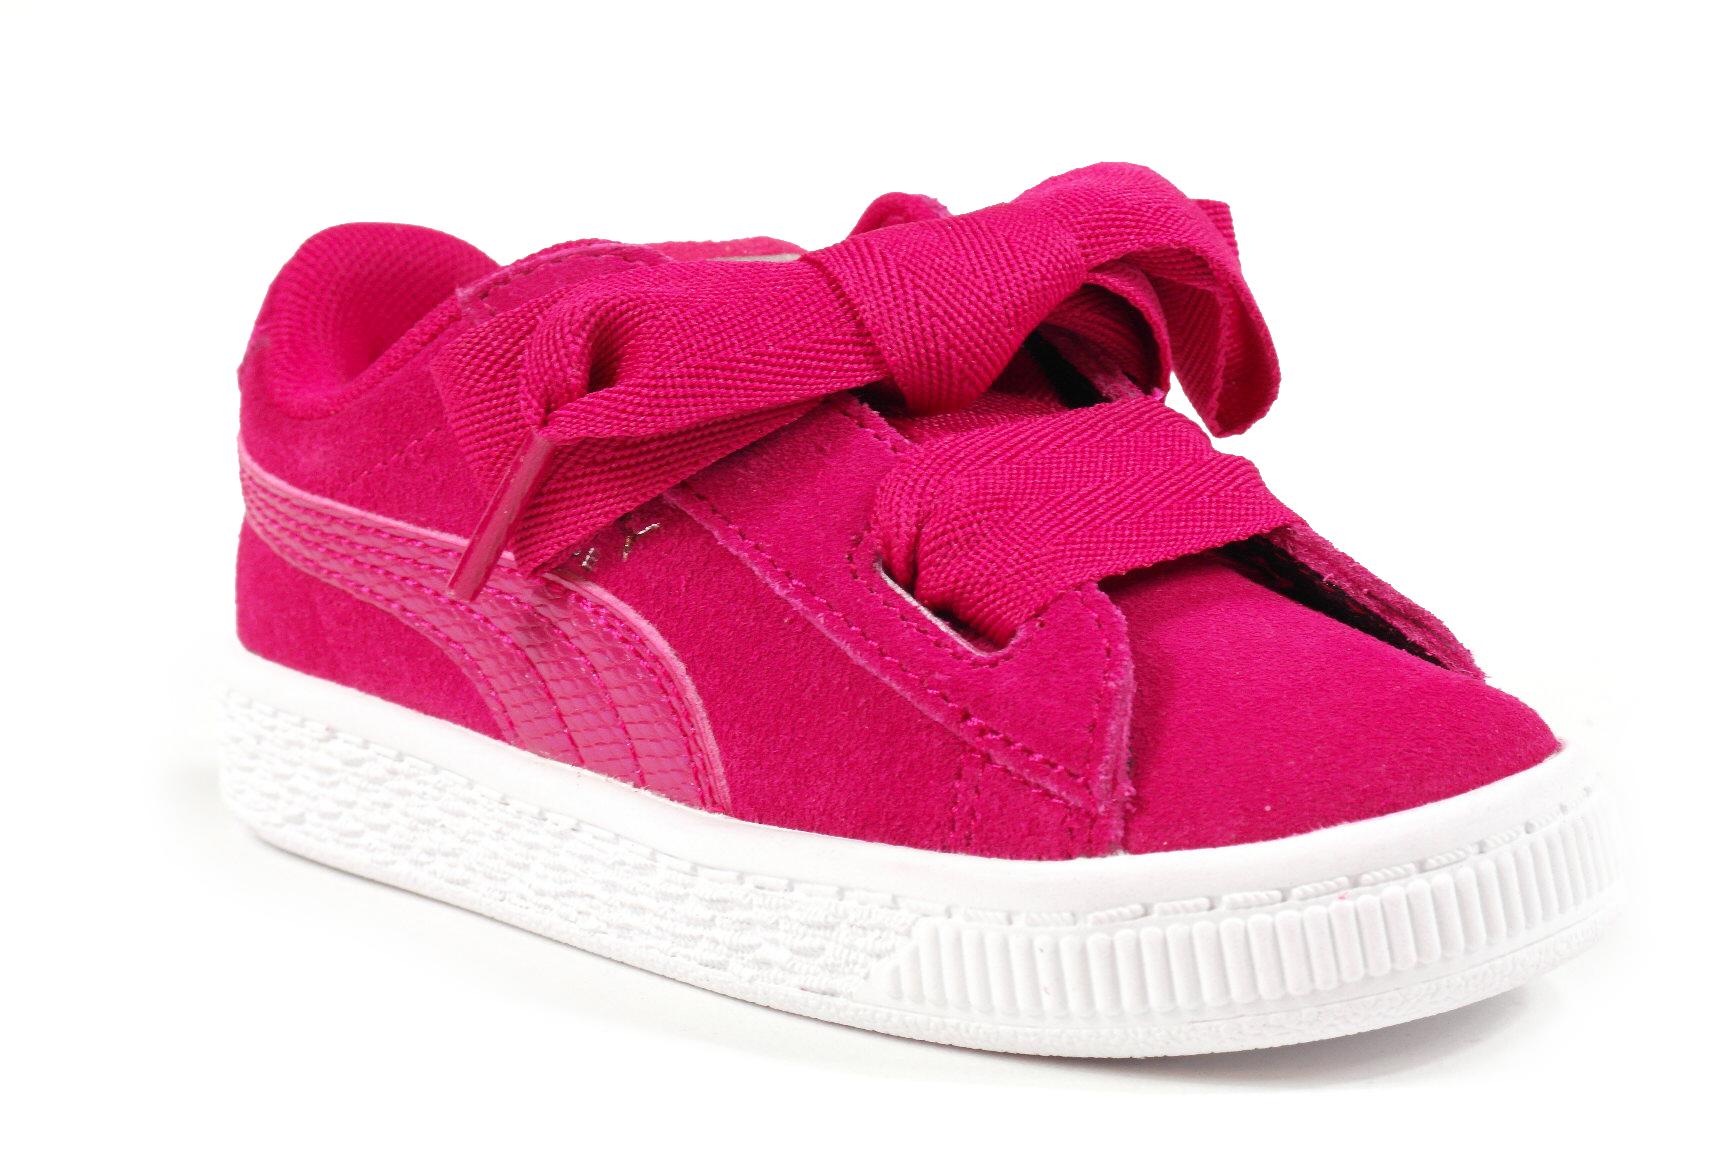 39dca2b5de8 Puma Suede Heart baby meisjesschoenen pink Puma Suede Heart baby  meisjesschoenen pink ...